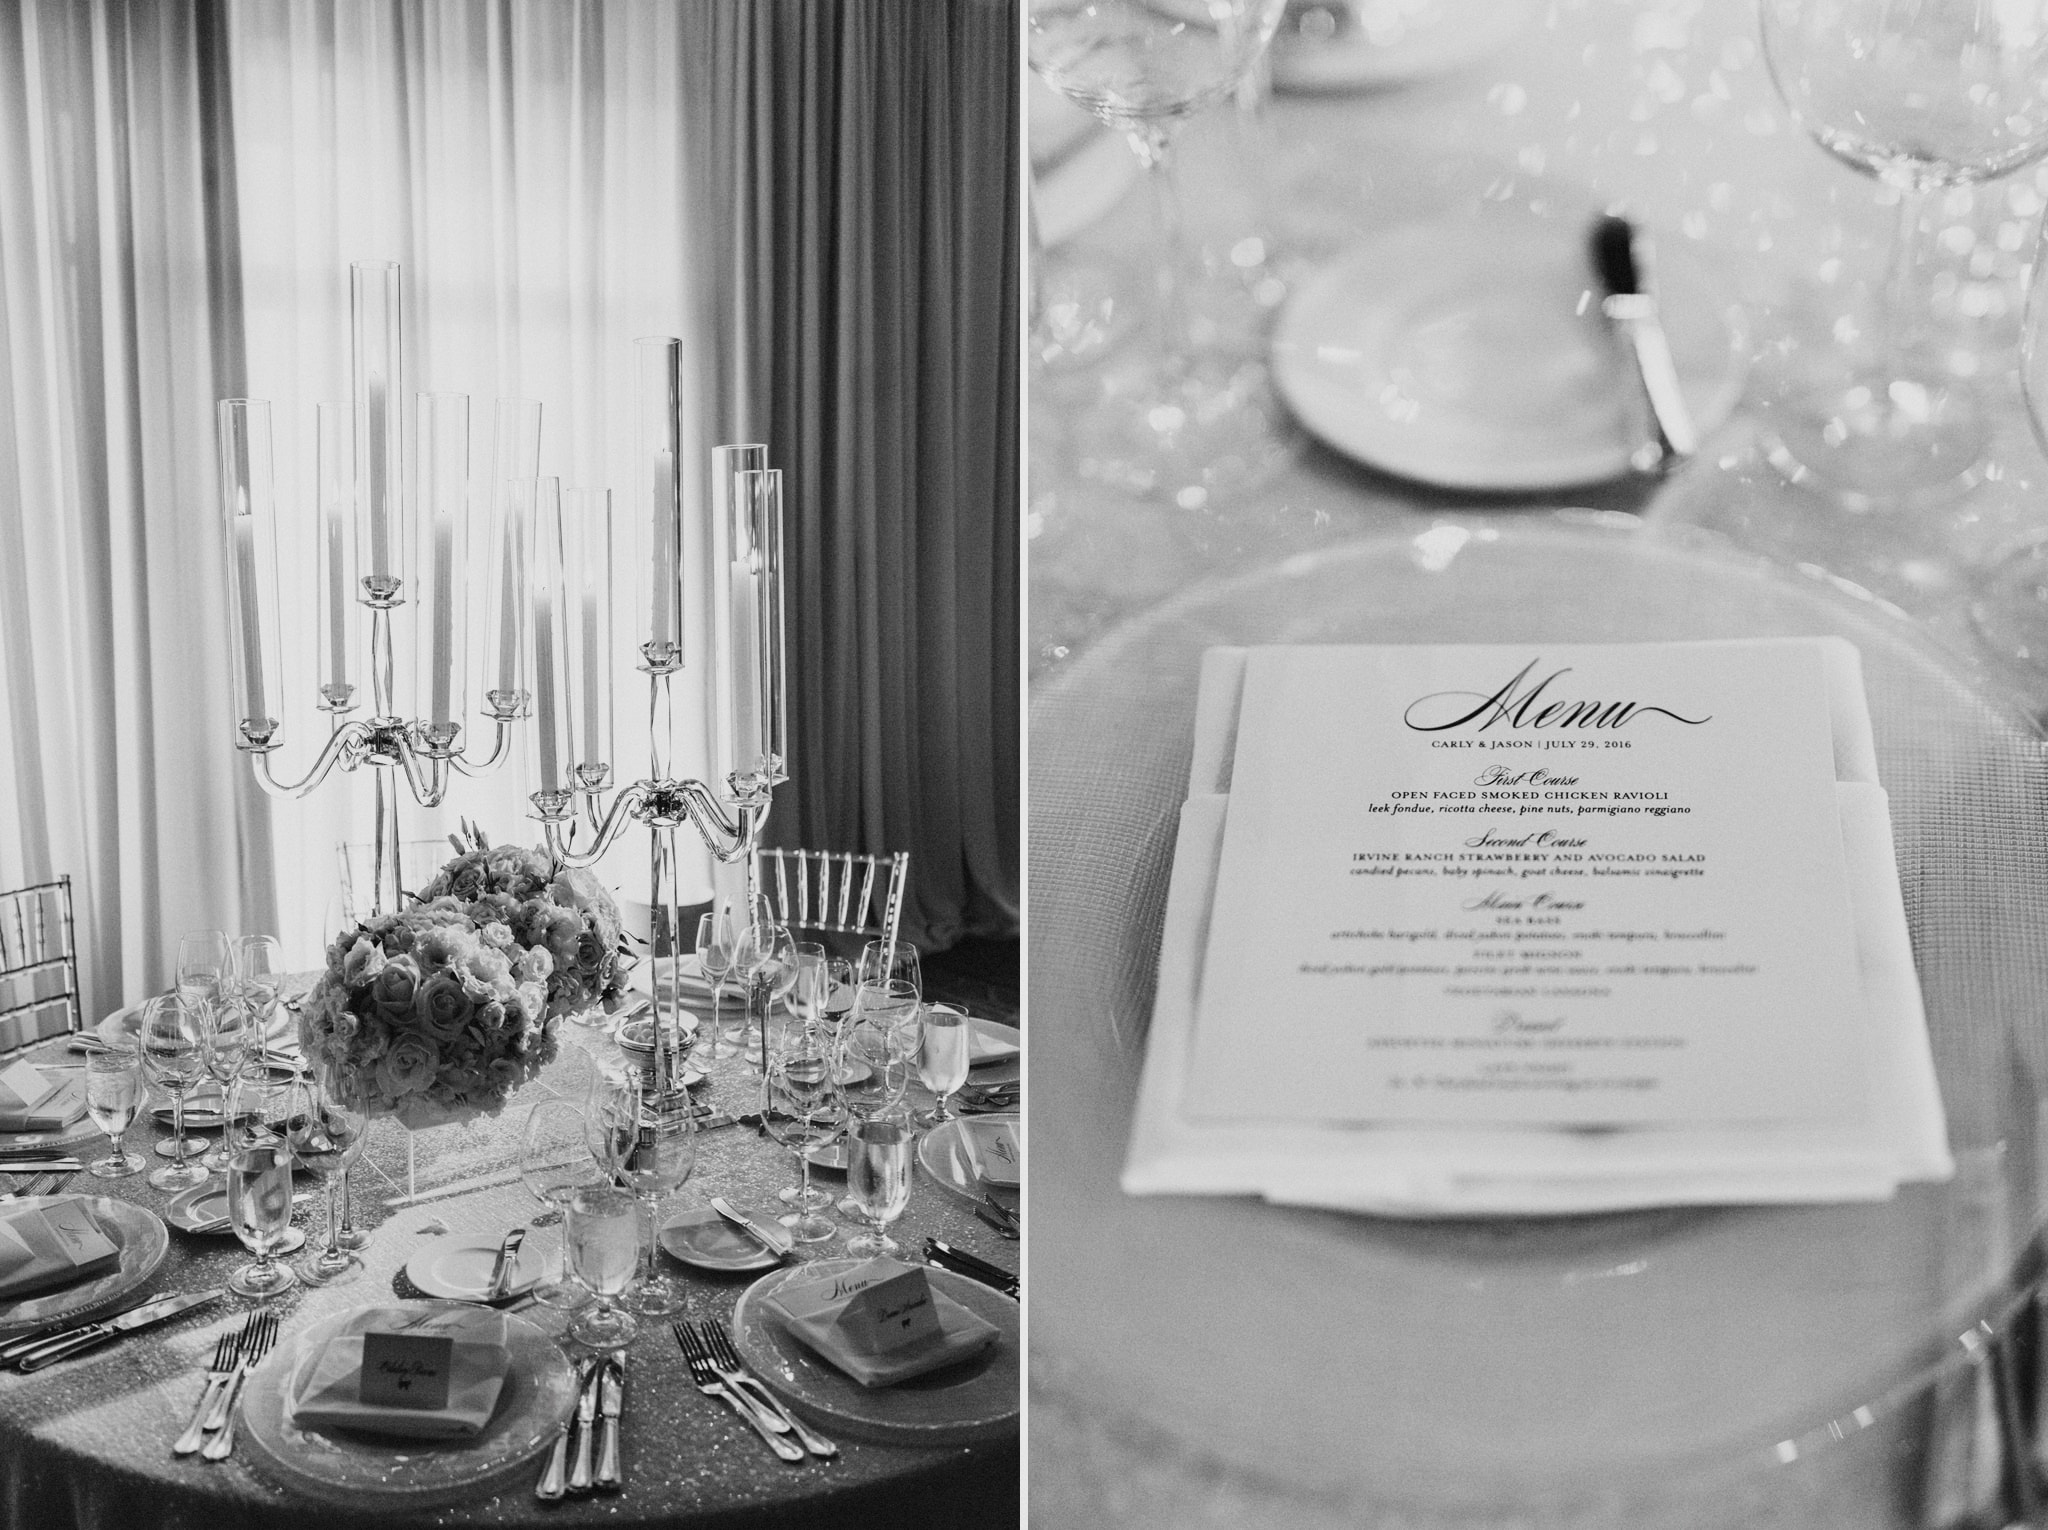 066-wedding-reception-venue-ideas.jpg